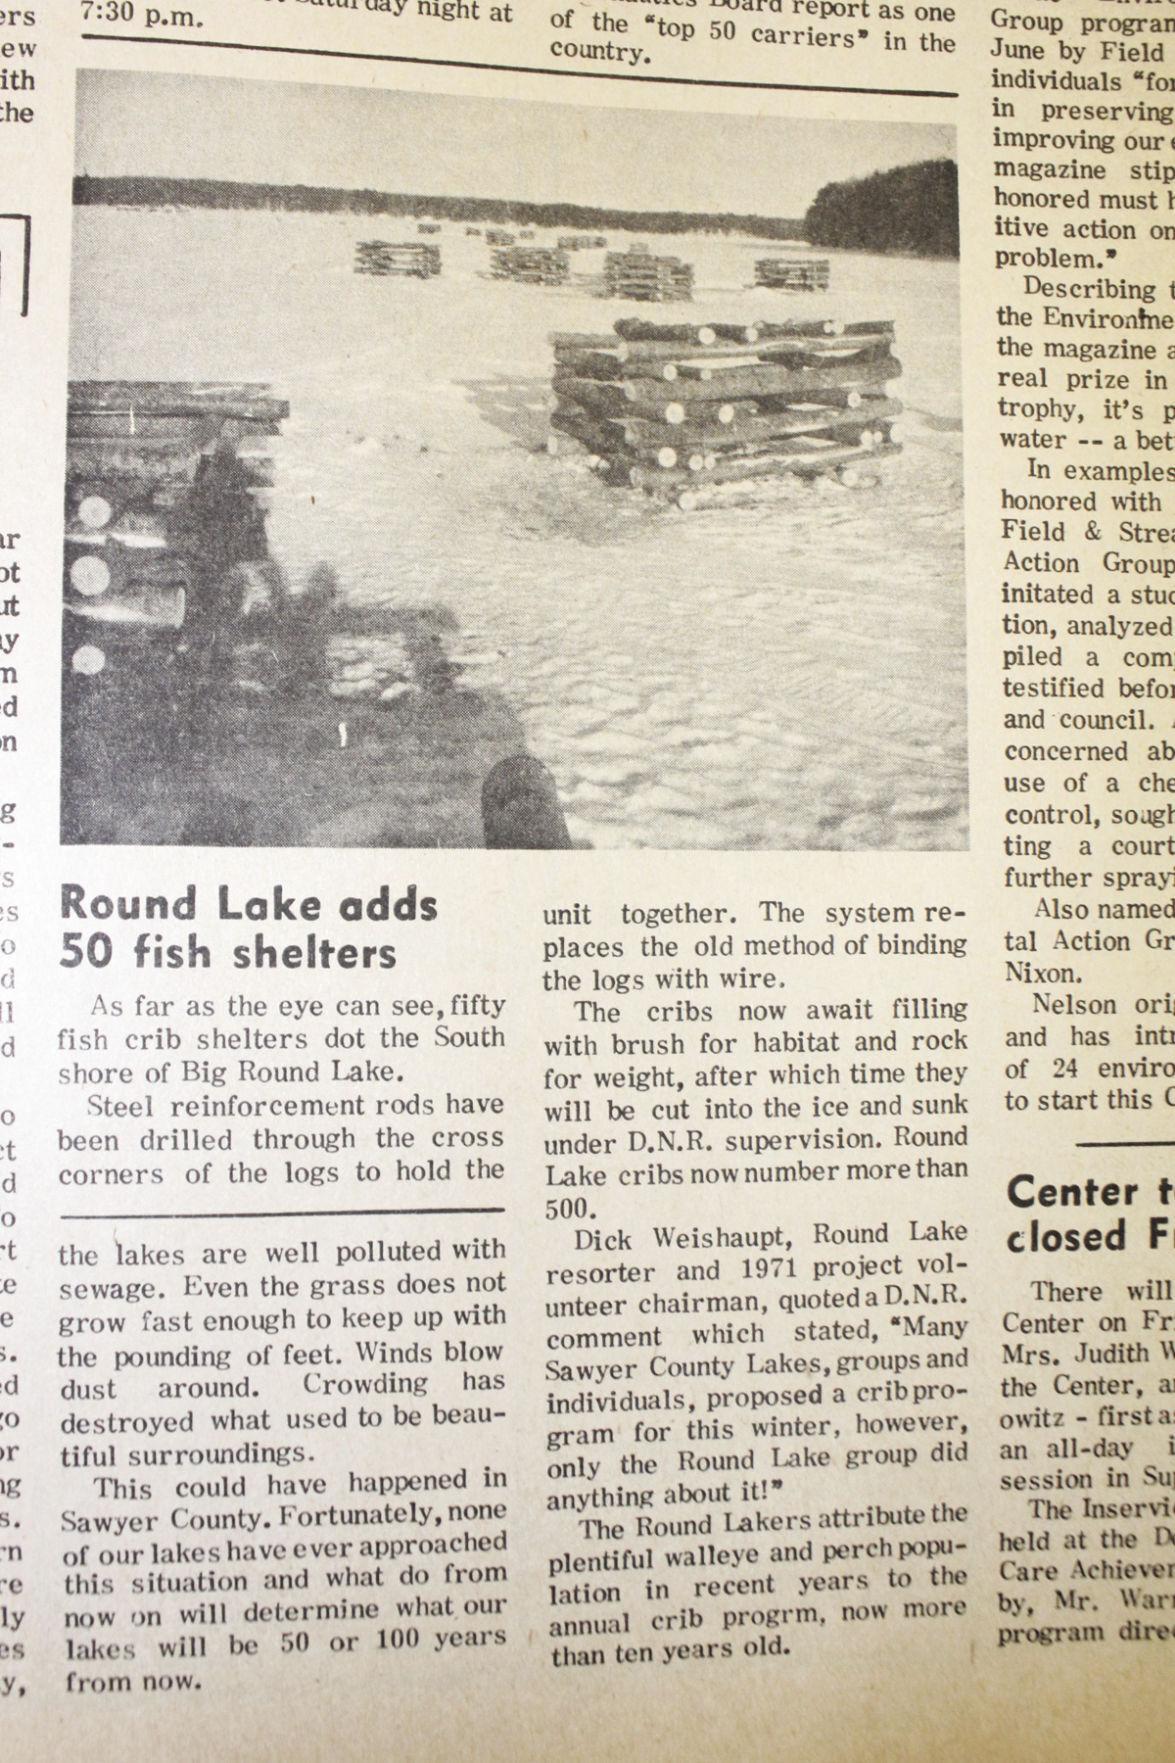 1971 fish cribs on Round Lake